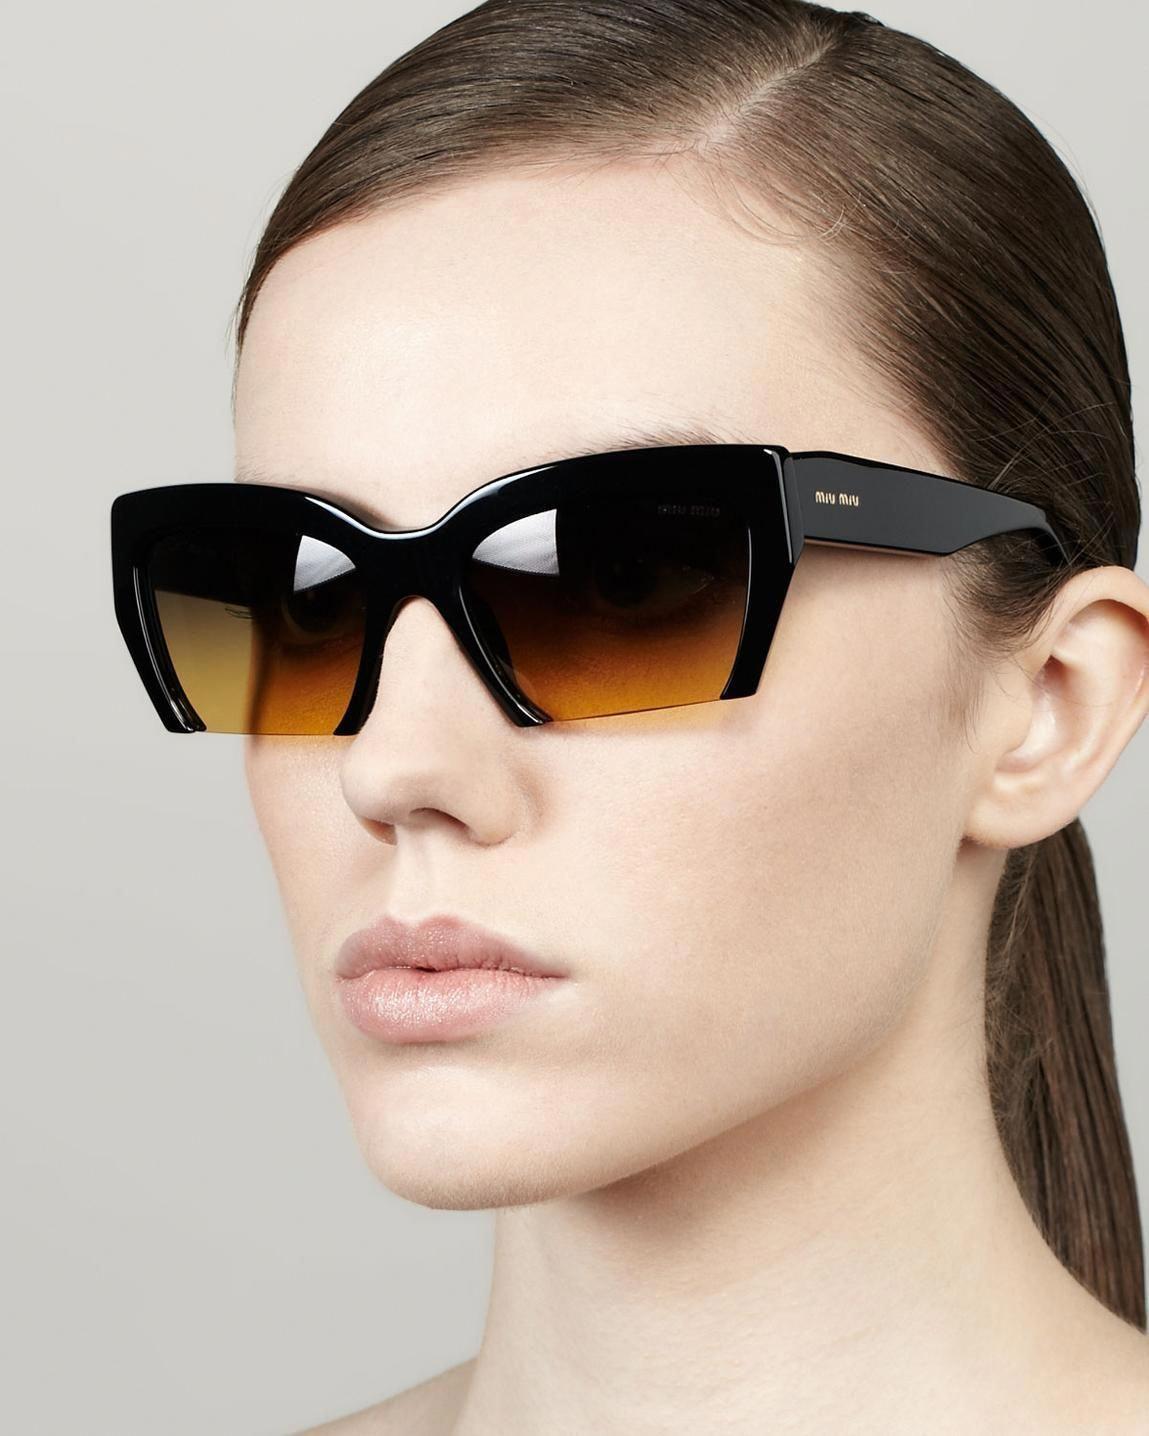 192fa816a603 miu miu eyewear - Pesquisa Google | Miu Miu | Sunglasses, Miu miu ...